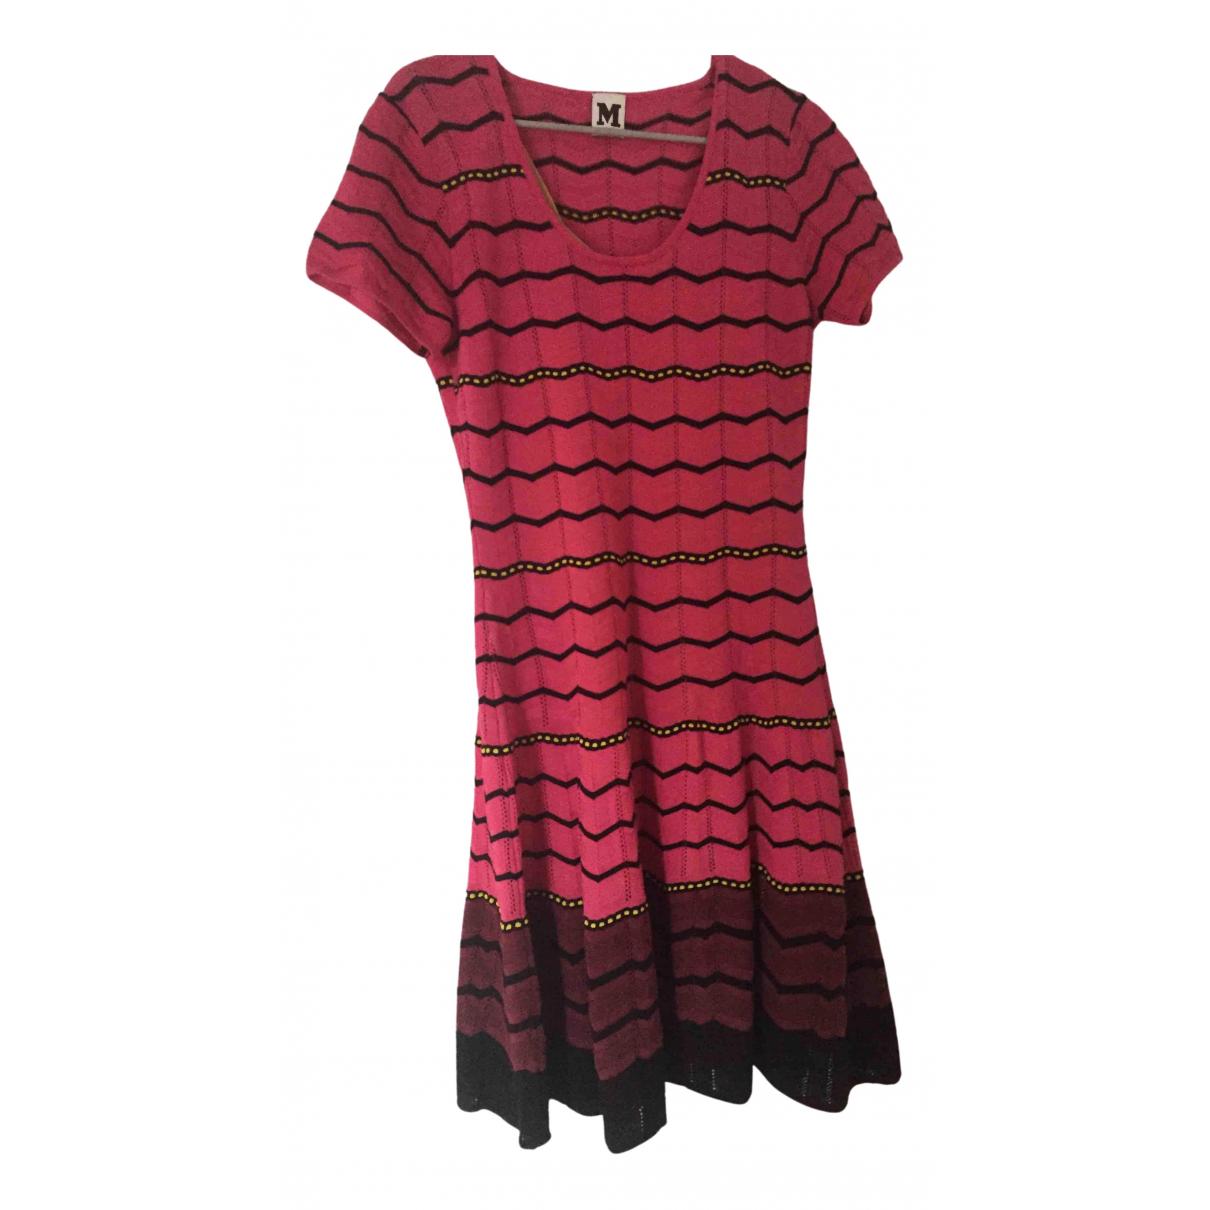 M Missoni \N Pink dress for Women 42 IT